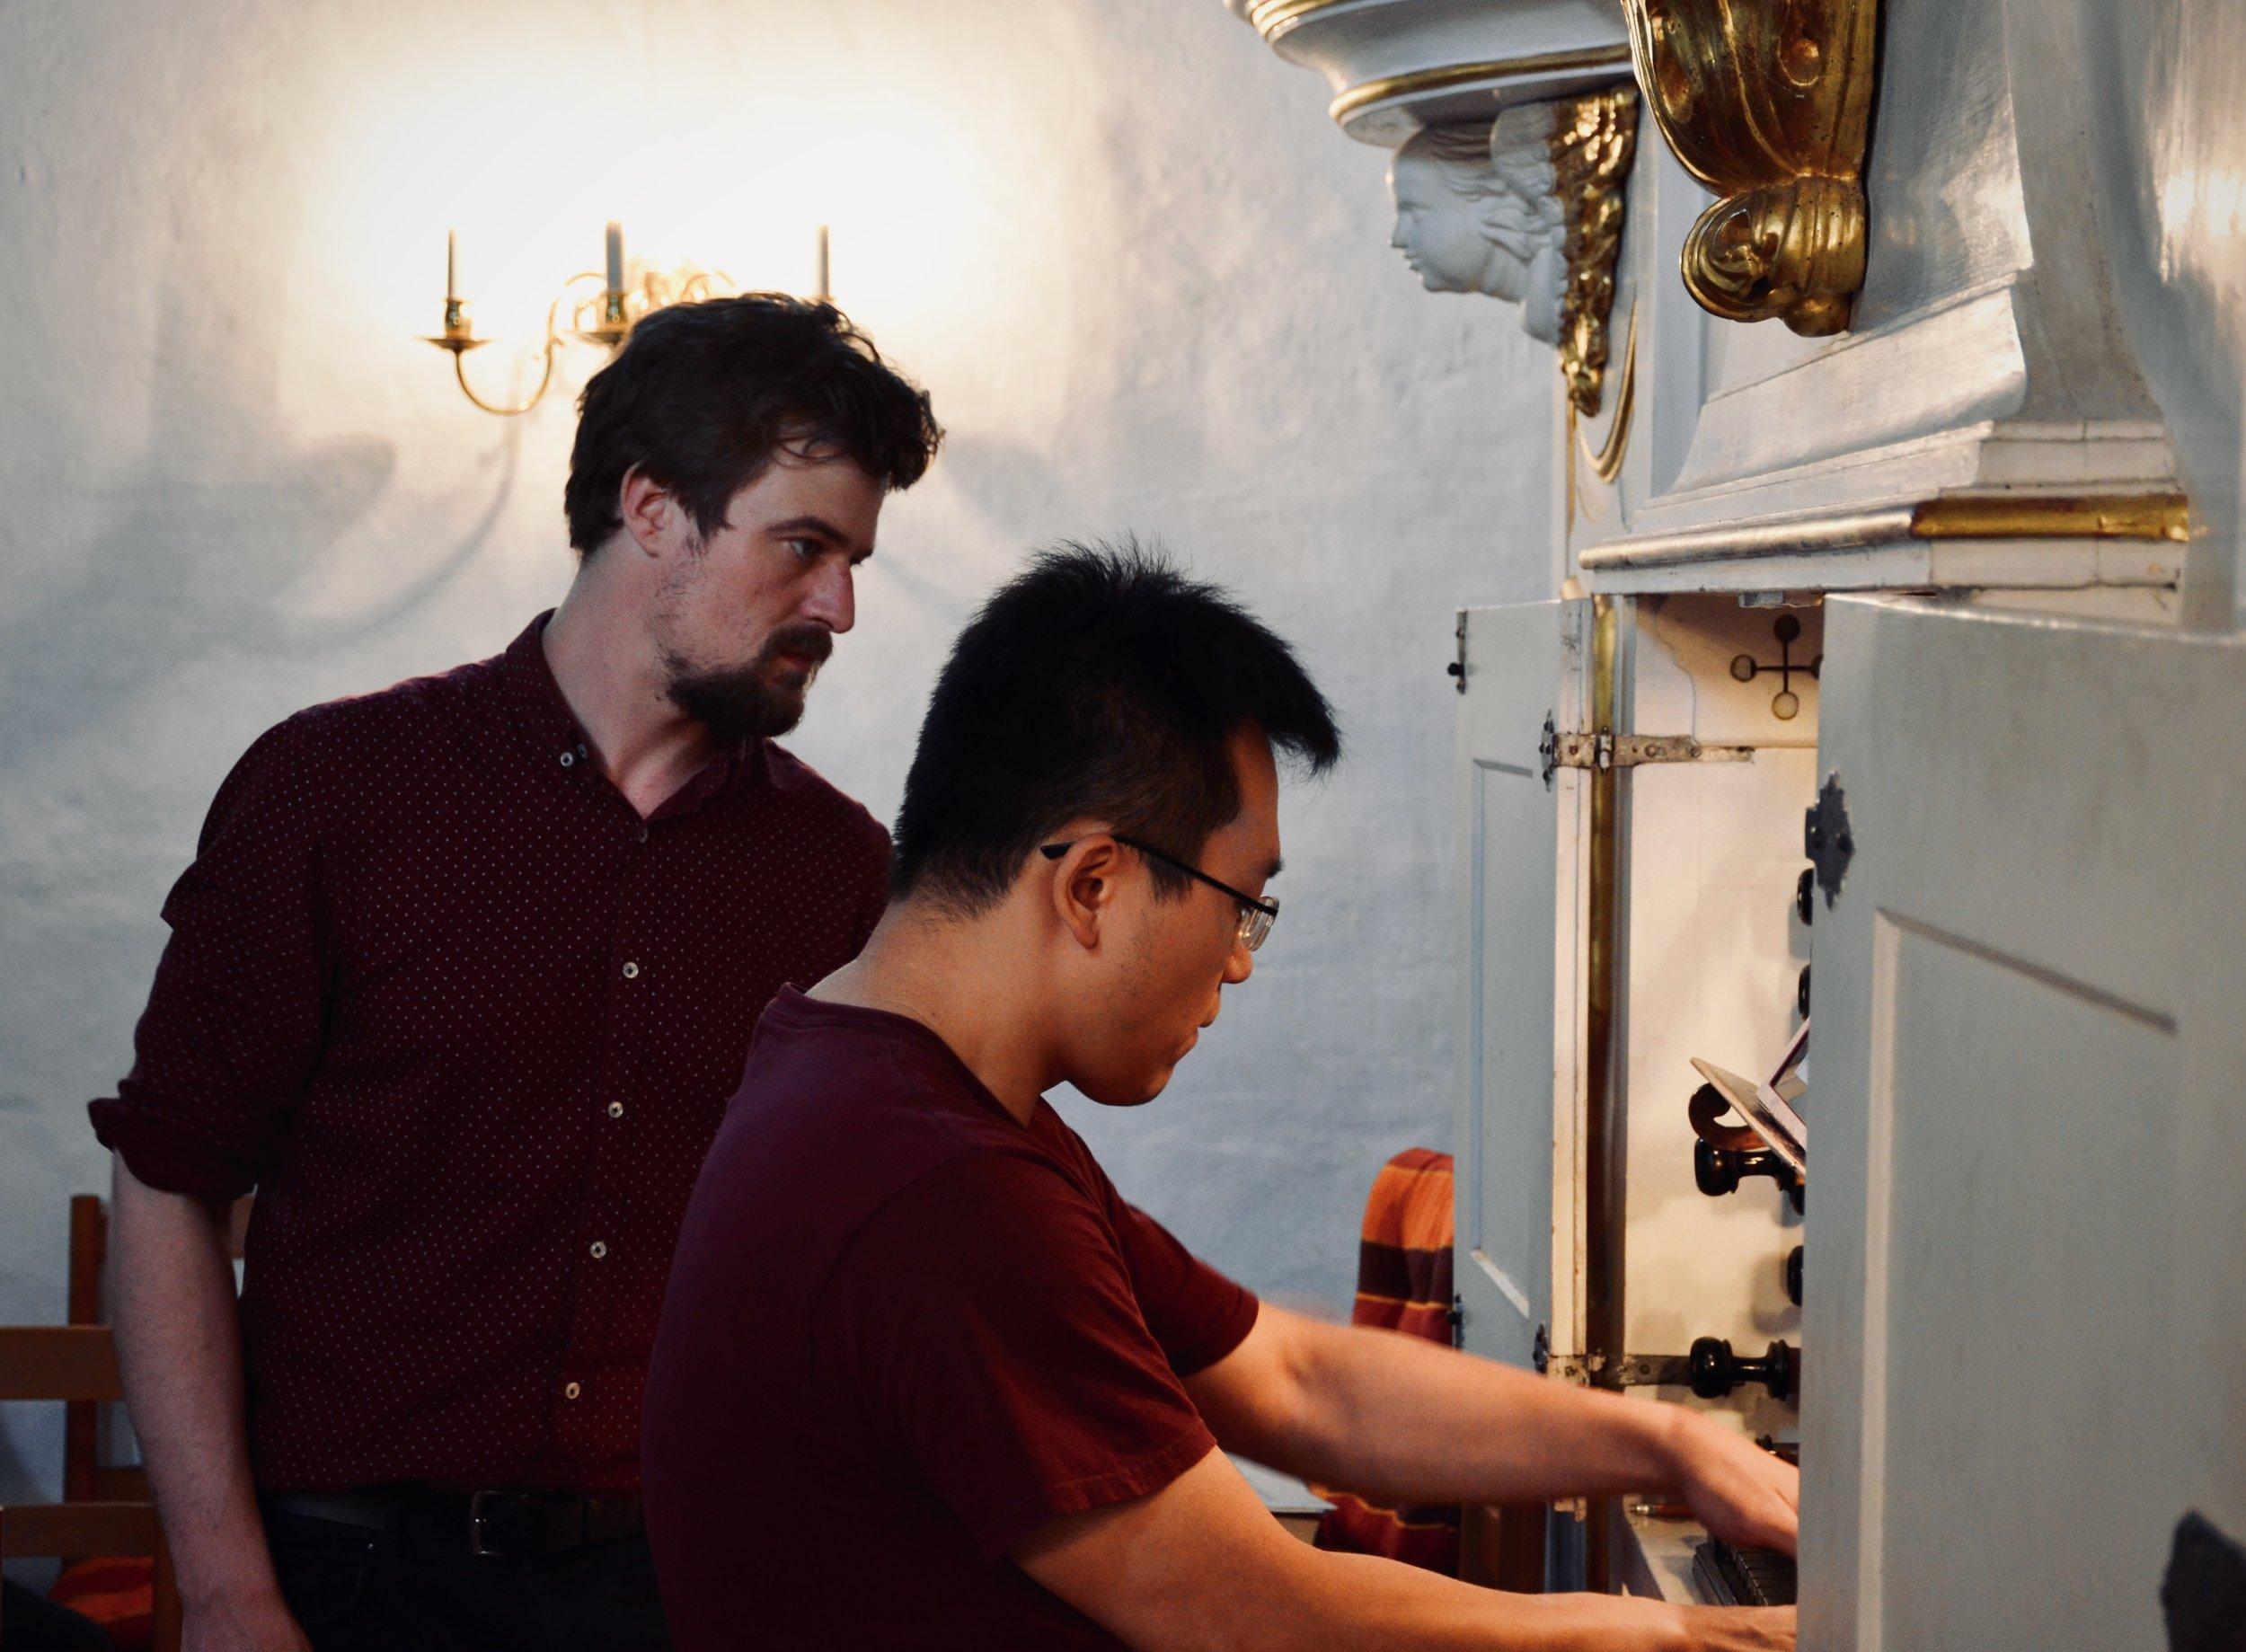 Martin Sturm assists Adrian Cho, 1722 Gottfried Silbermann Organ, Killianskirche, Bad Lausick